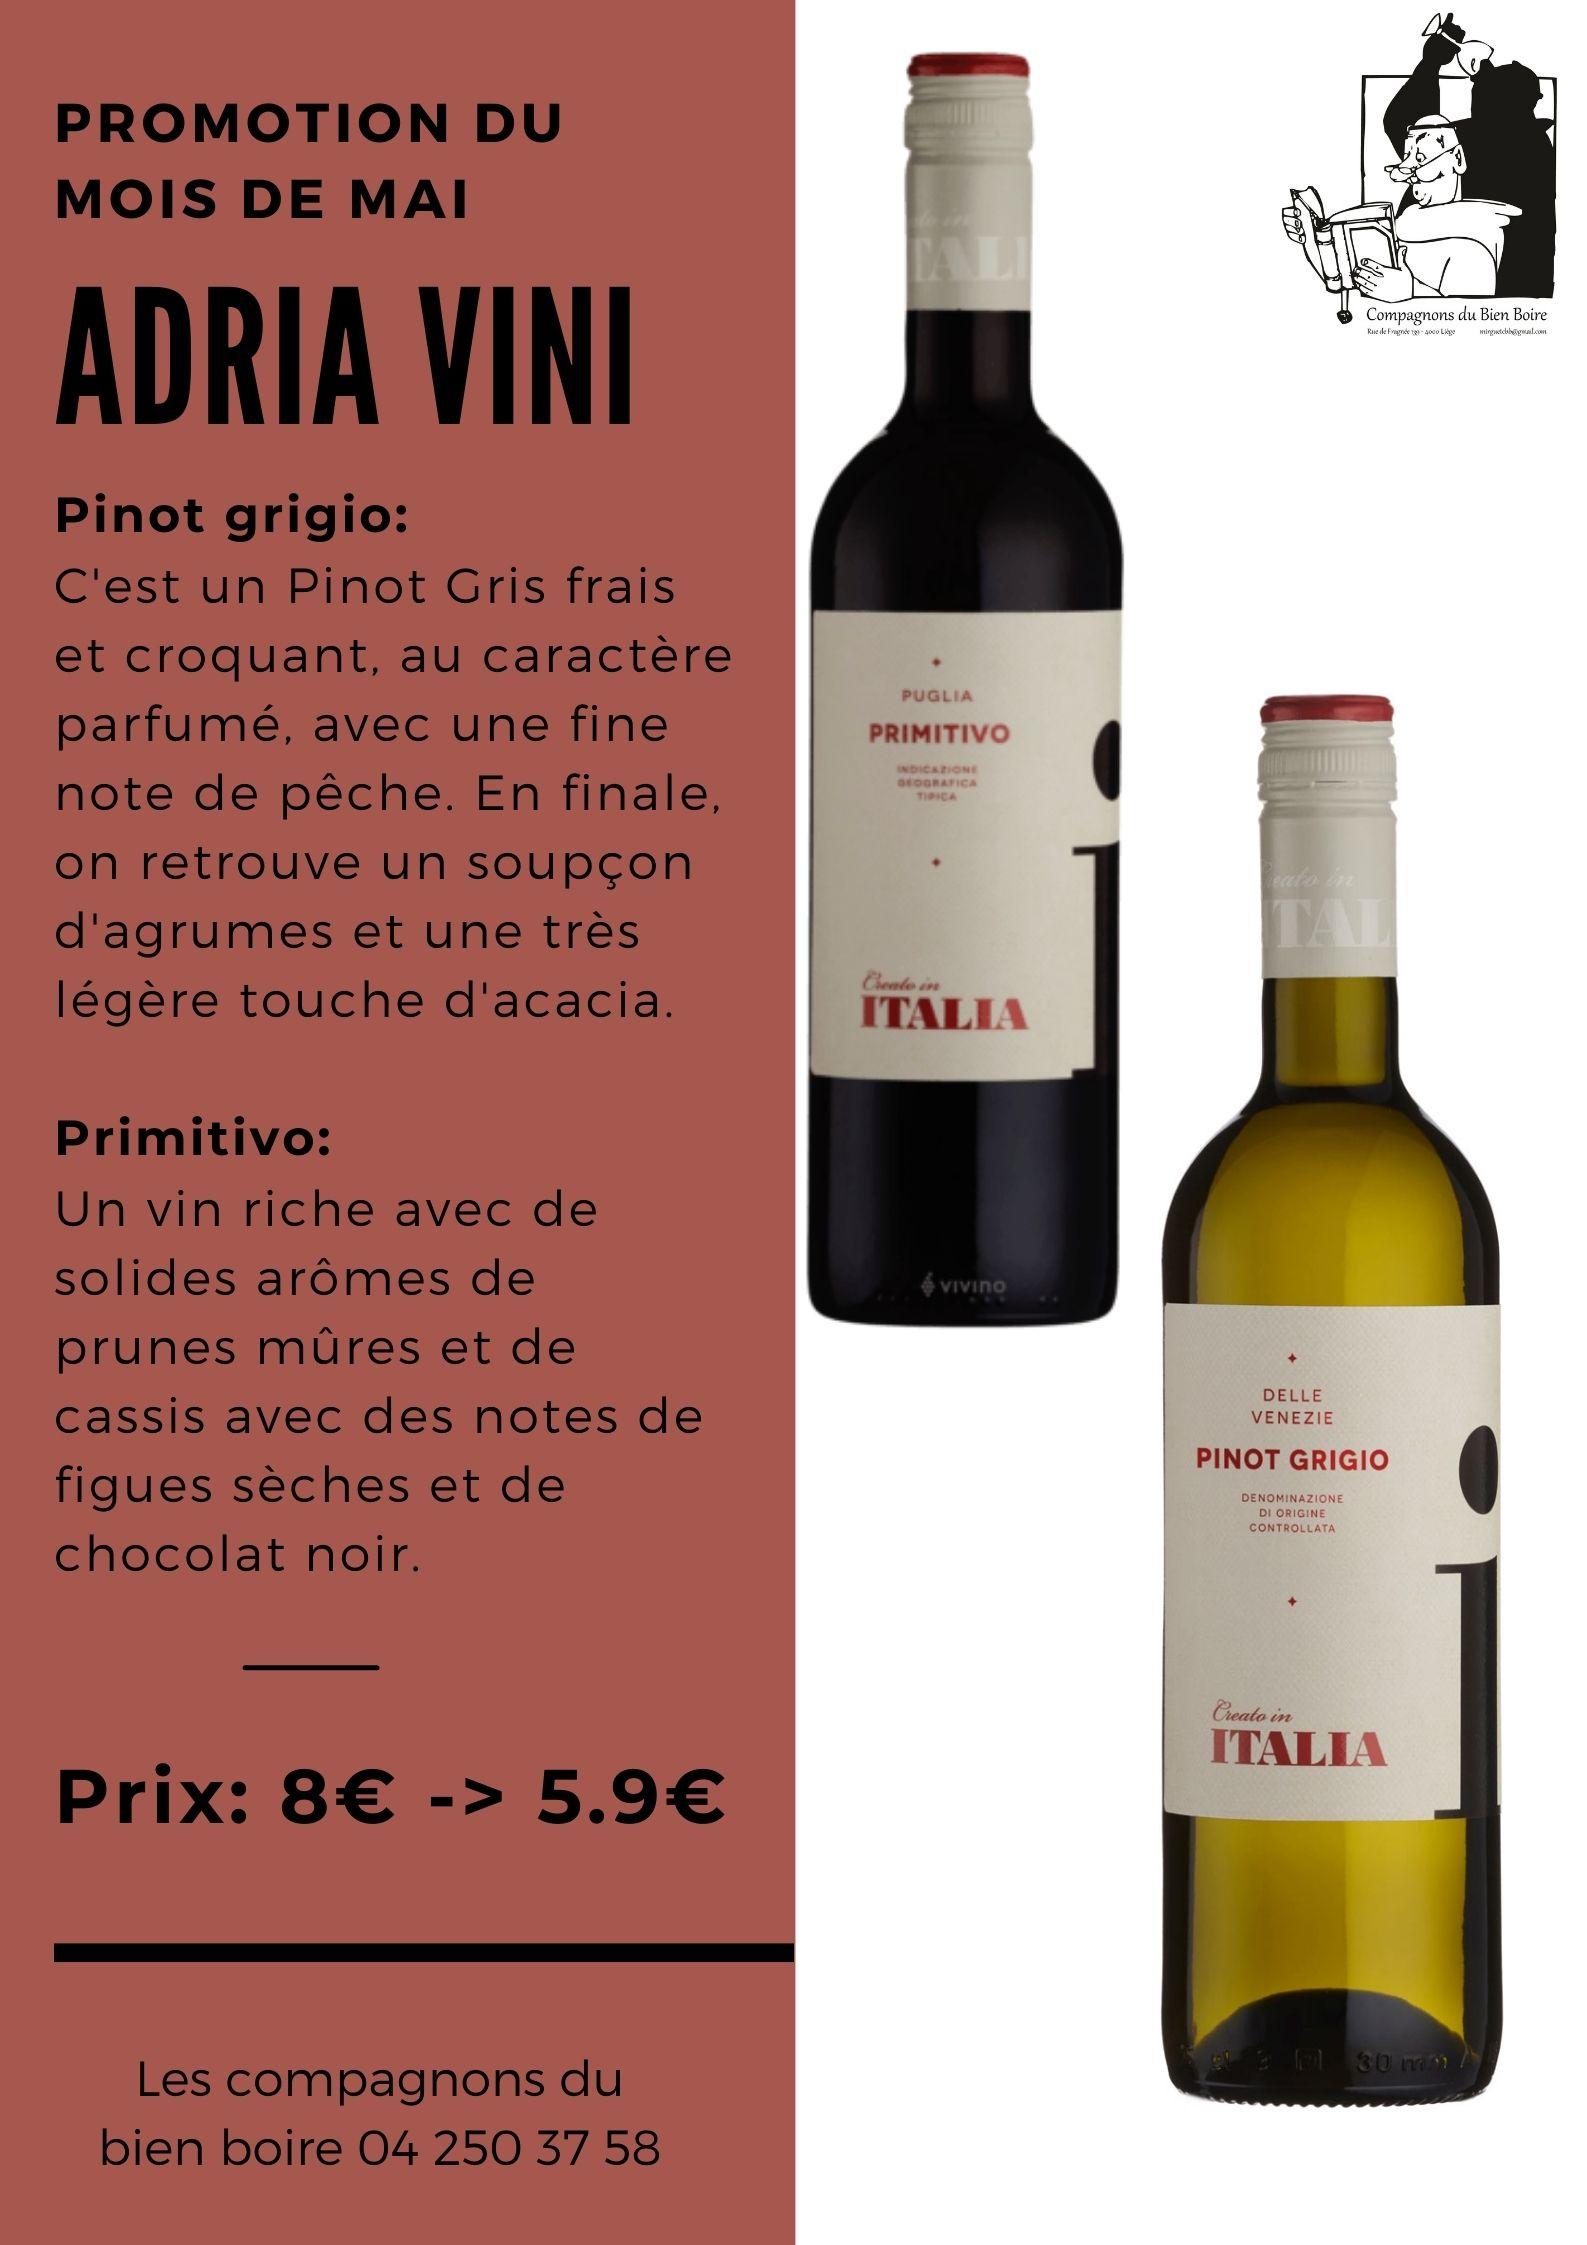 Vin de Mai/Juin 2021 : Adria Vini